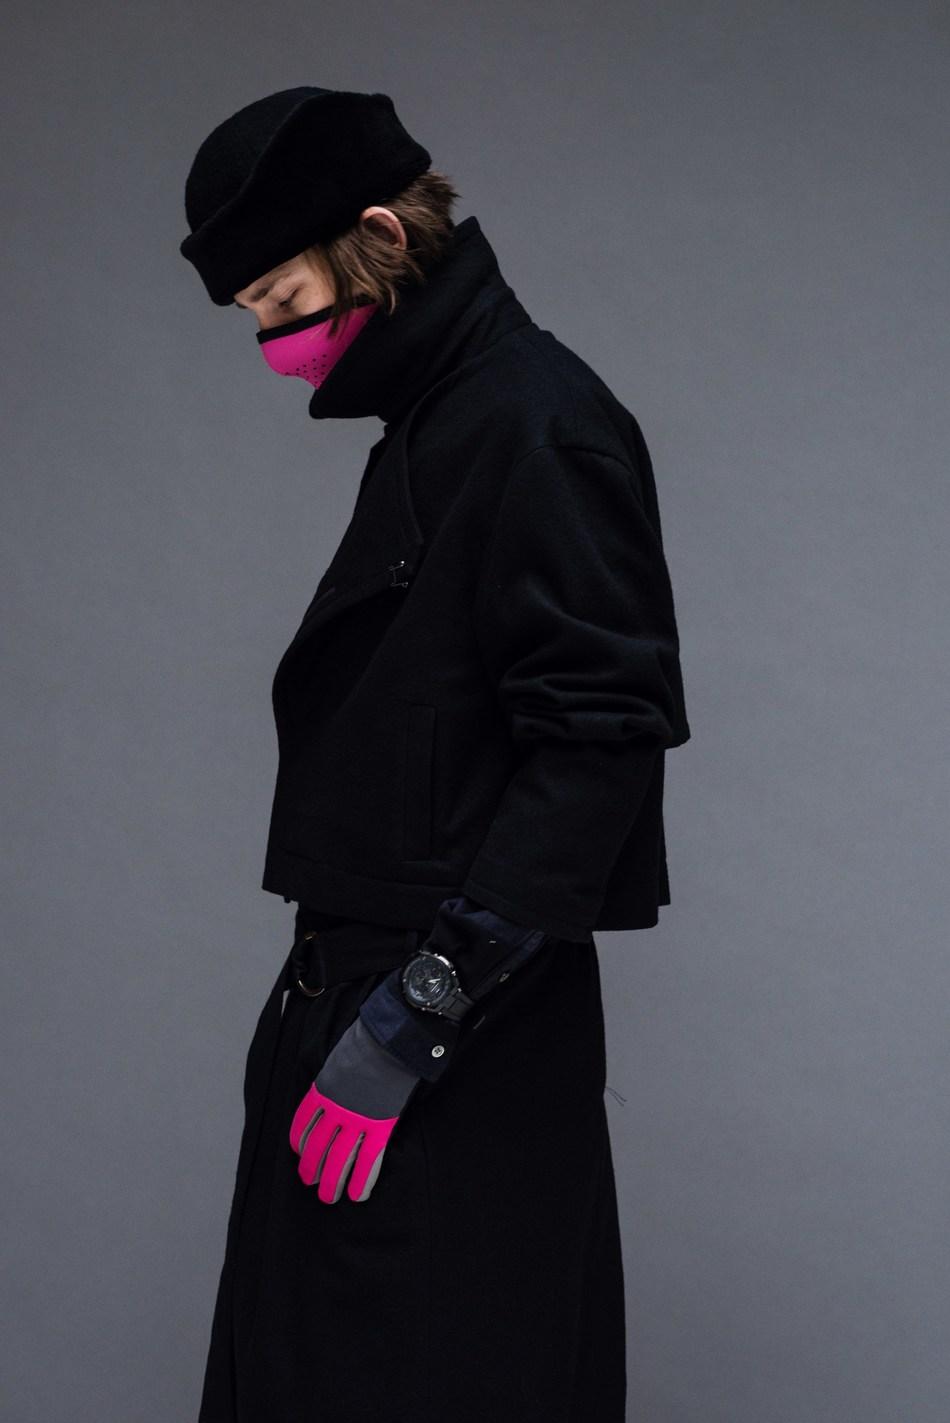 A model in Robert Geller's A/W17 NYFW show wears the G-SHOCK G-STEEL GSTS100G-1B (Photo Credit: Shawn Brackbill).